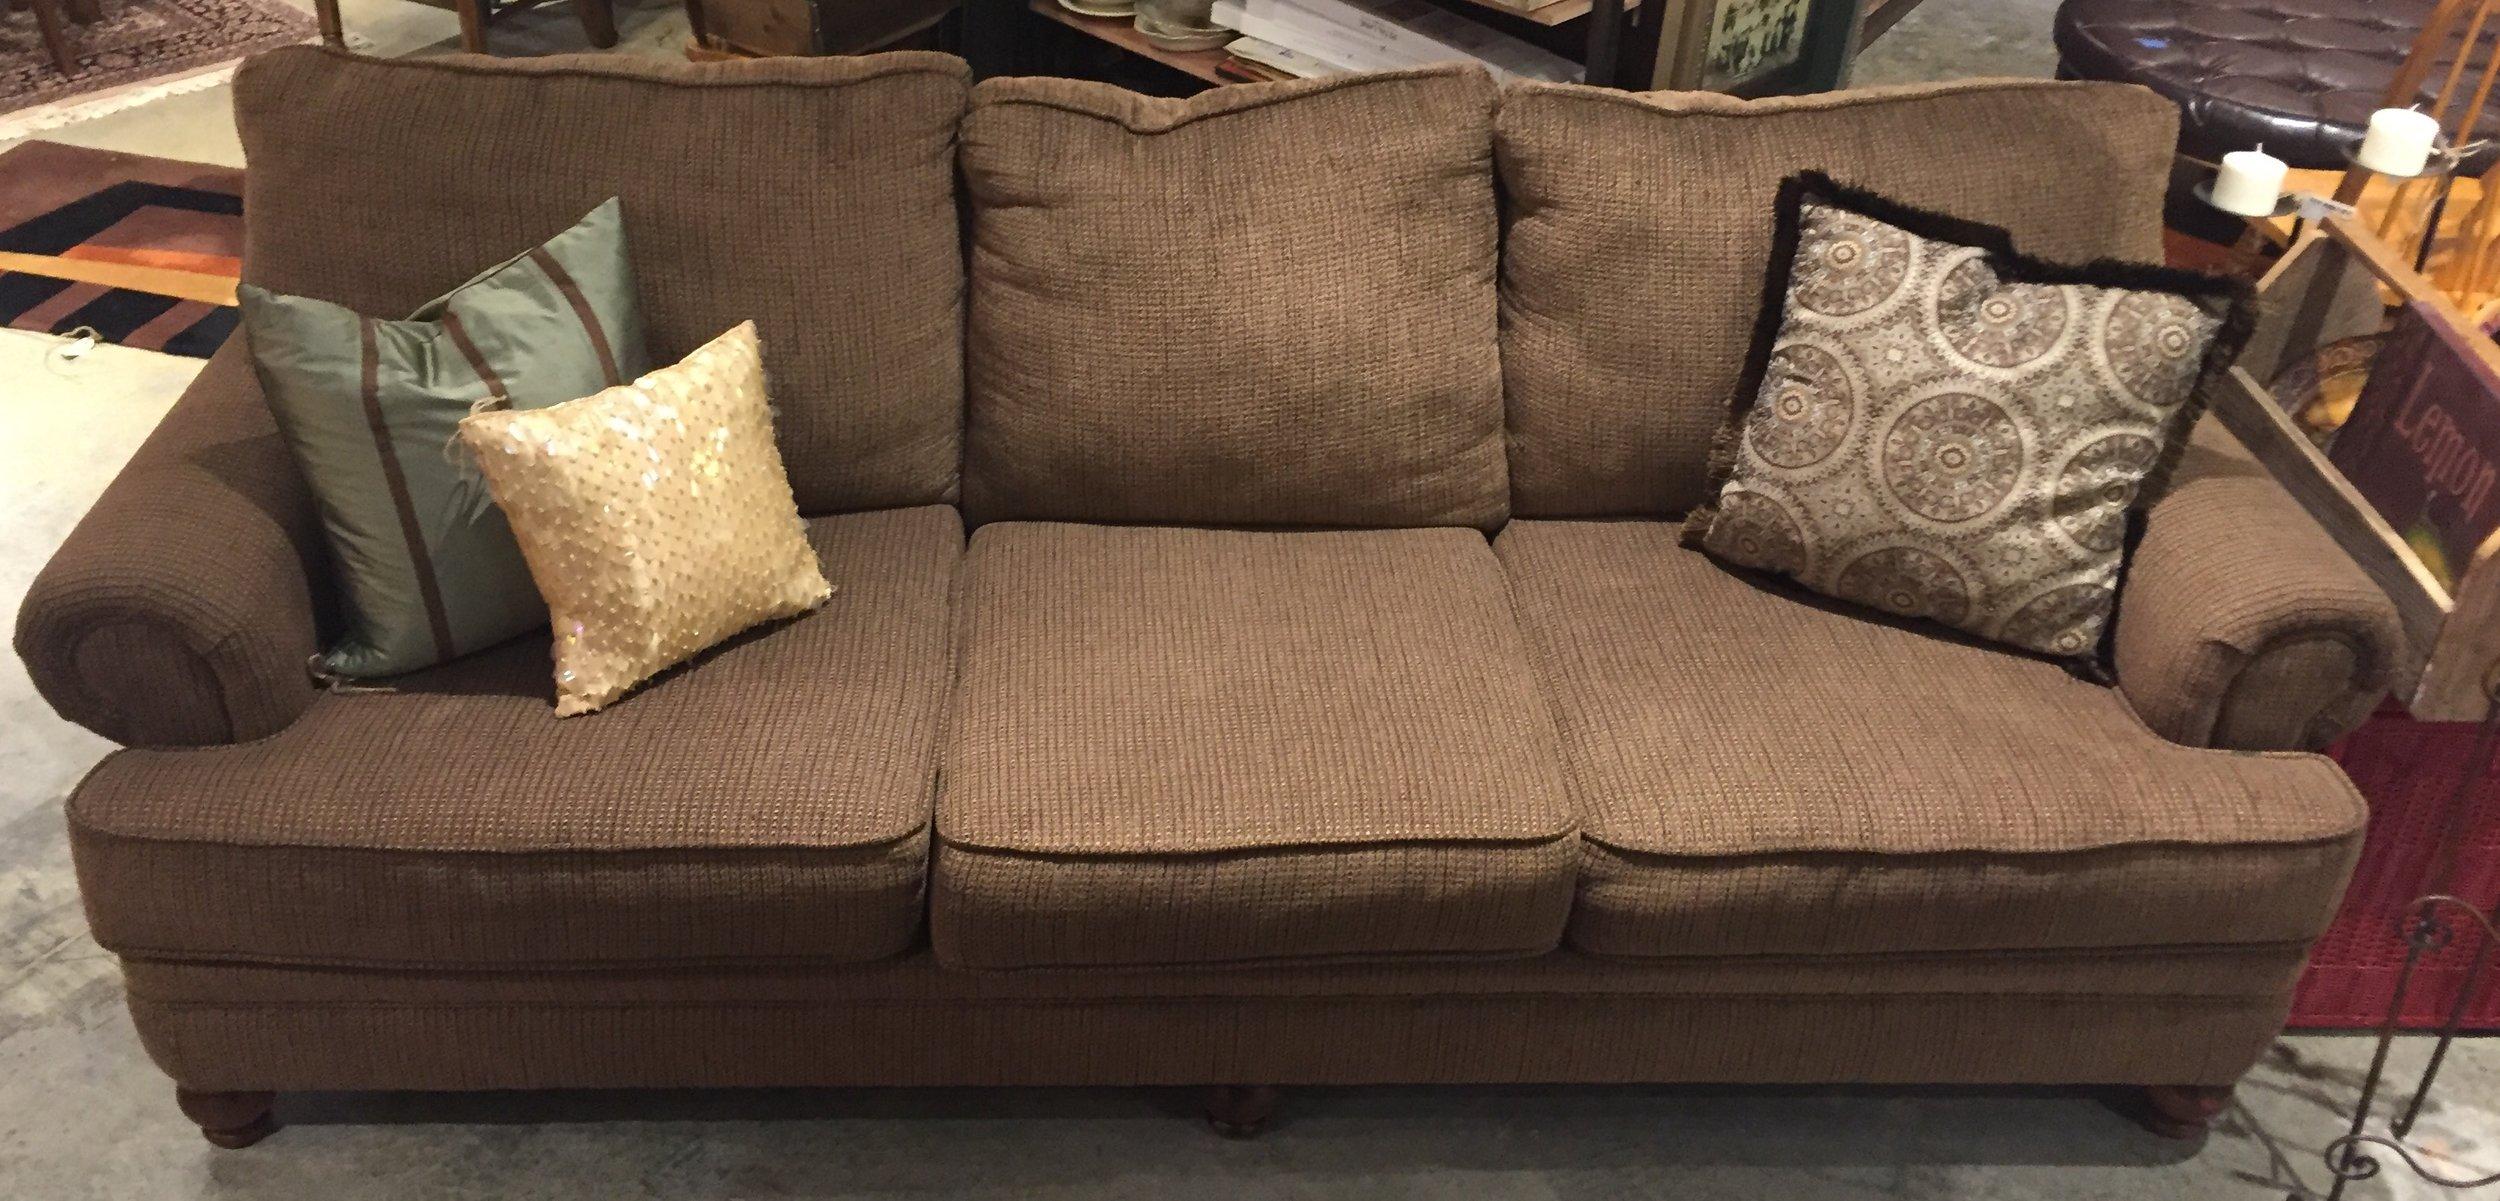 Brown Tweed Sofa - $449.95 C1054